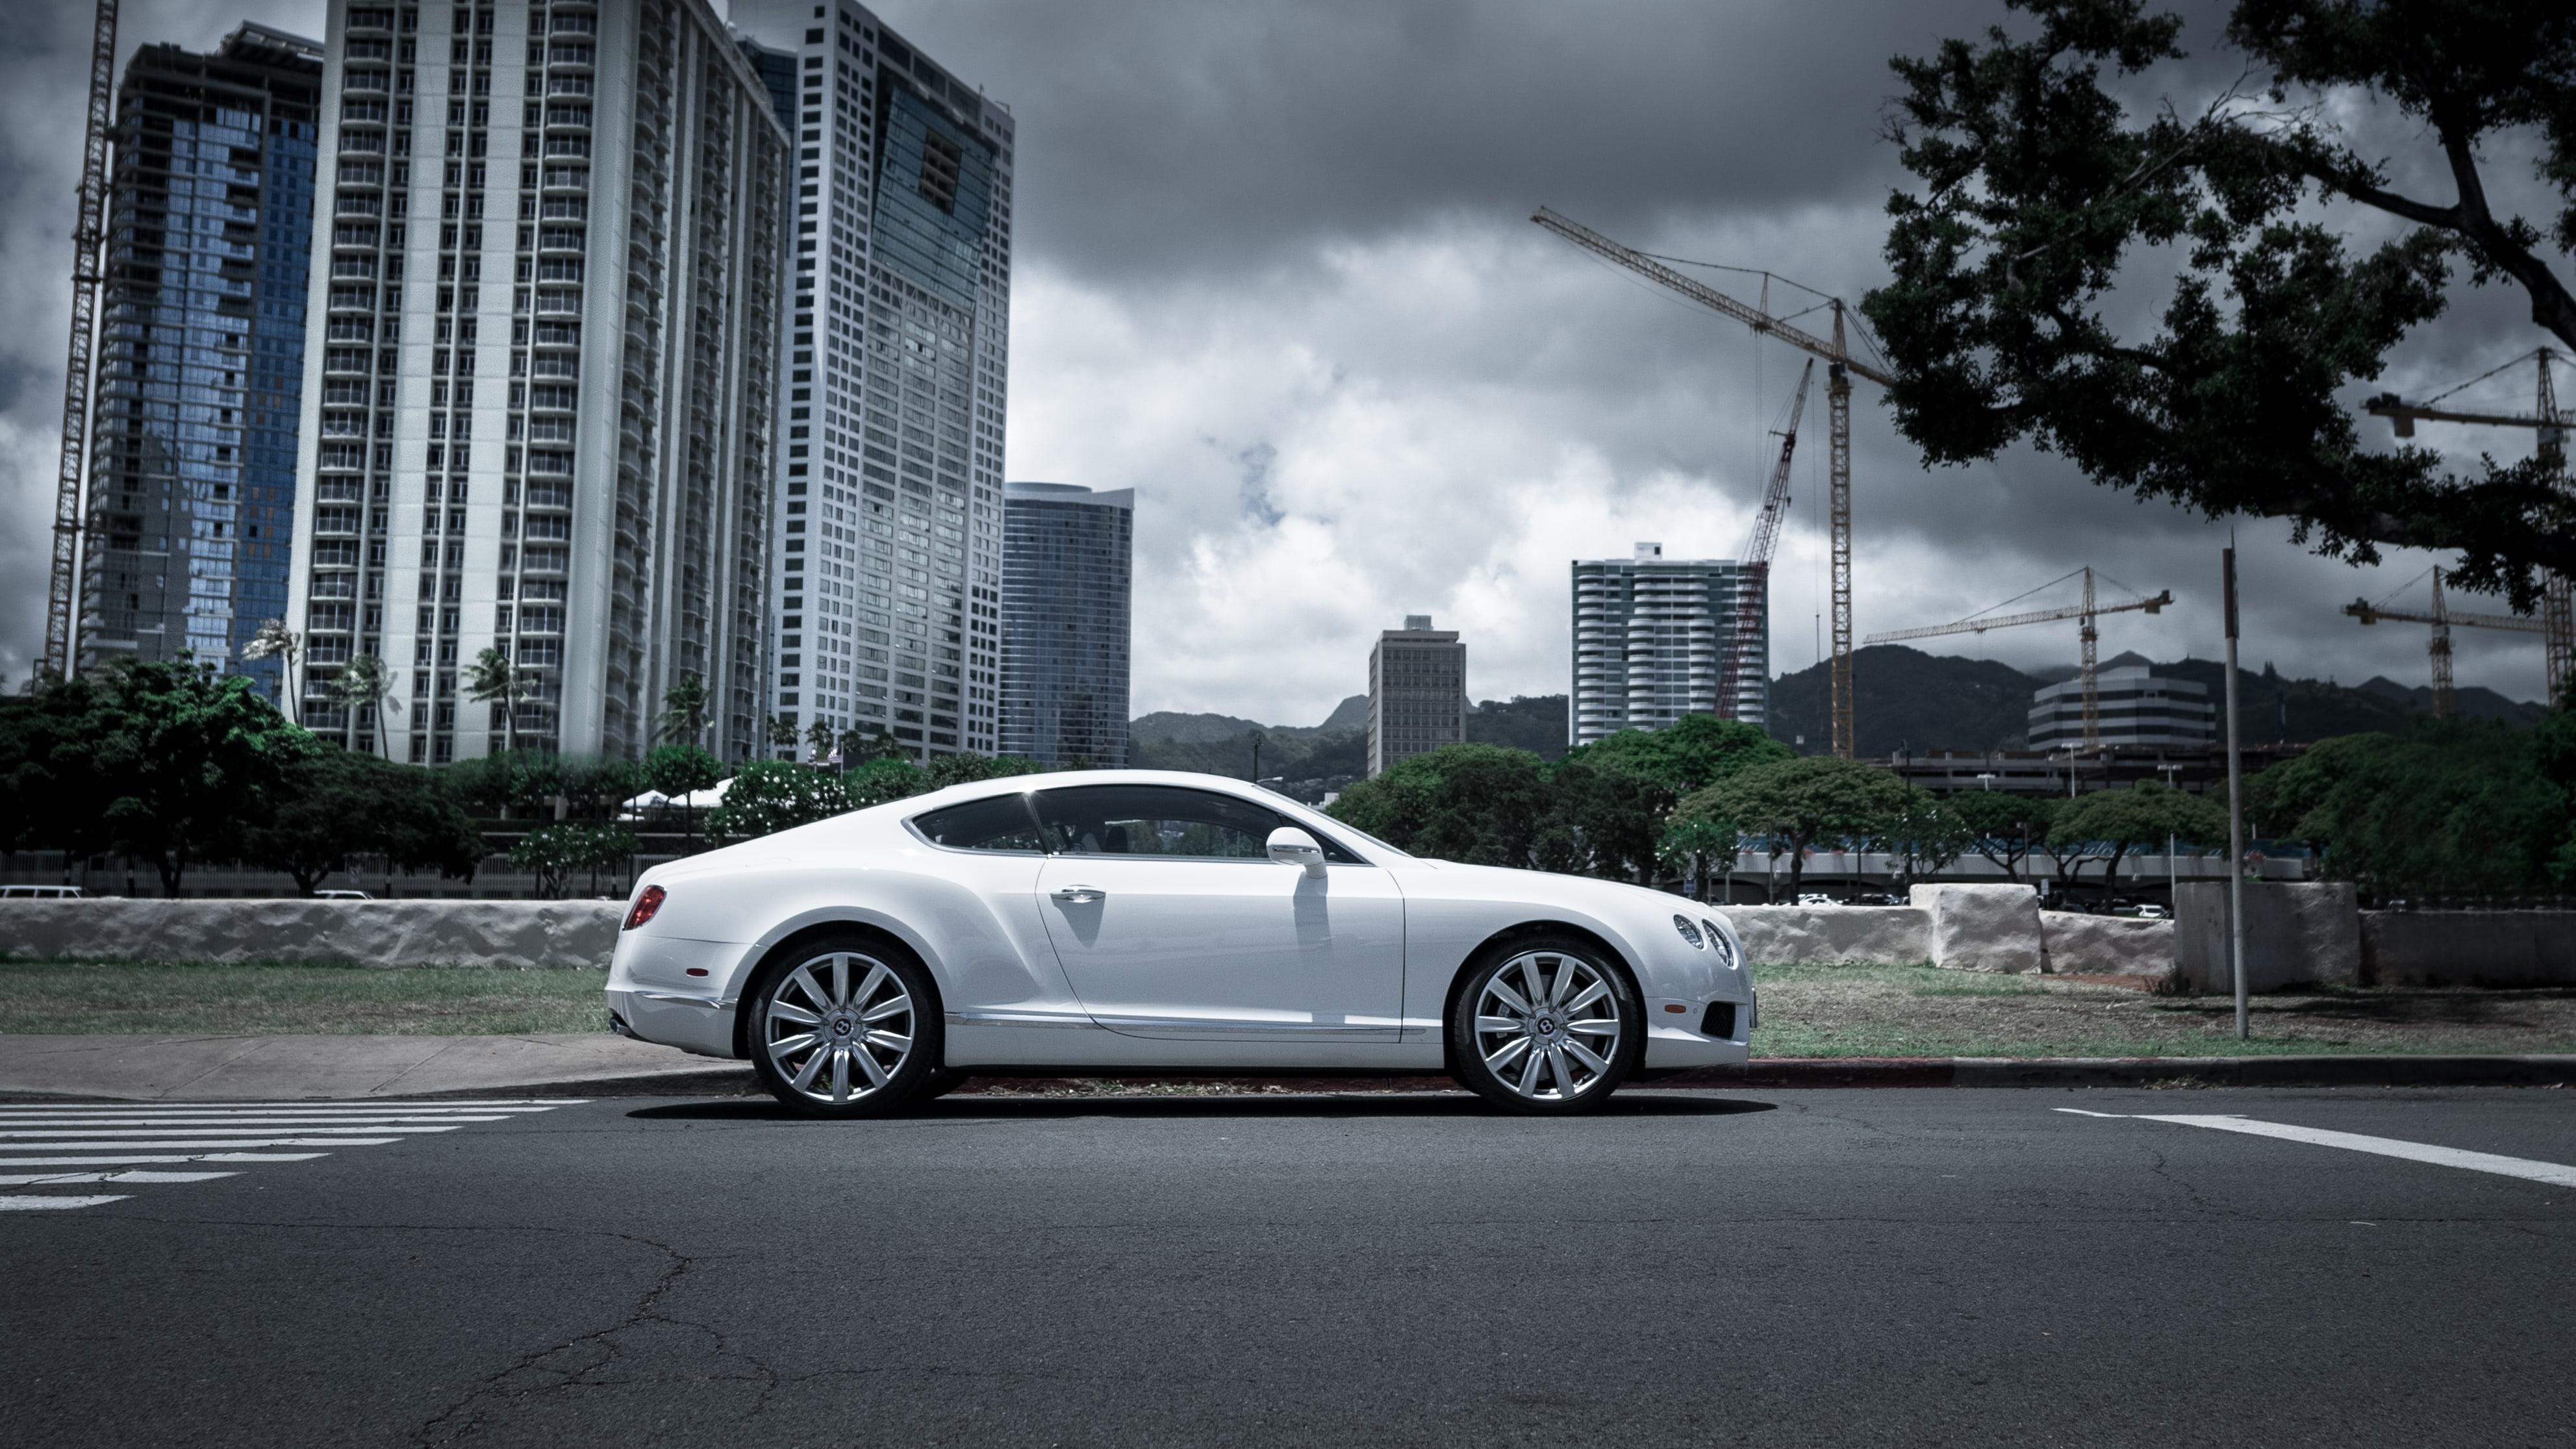 Velocity Honolulu - 2016 Bentley Continental GT